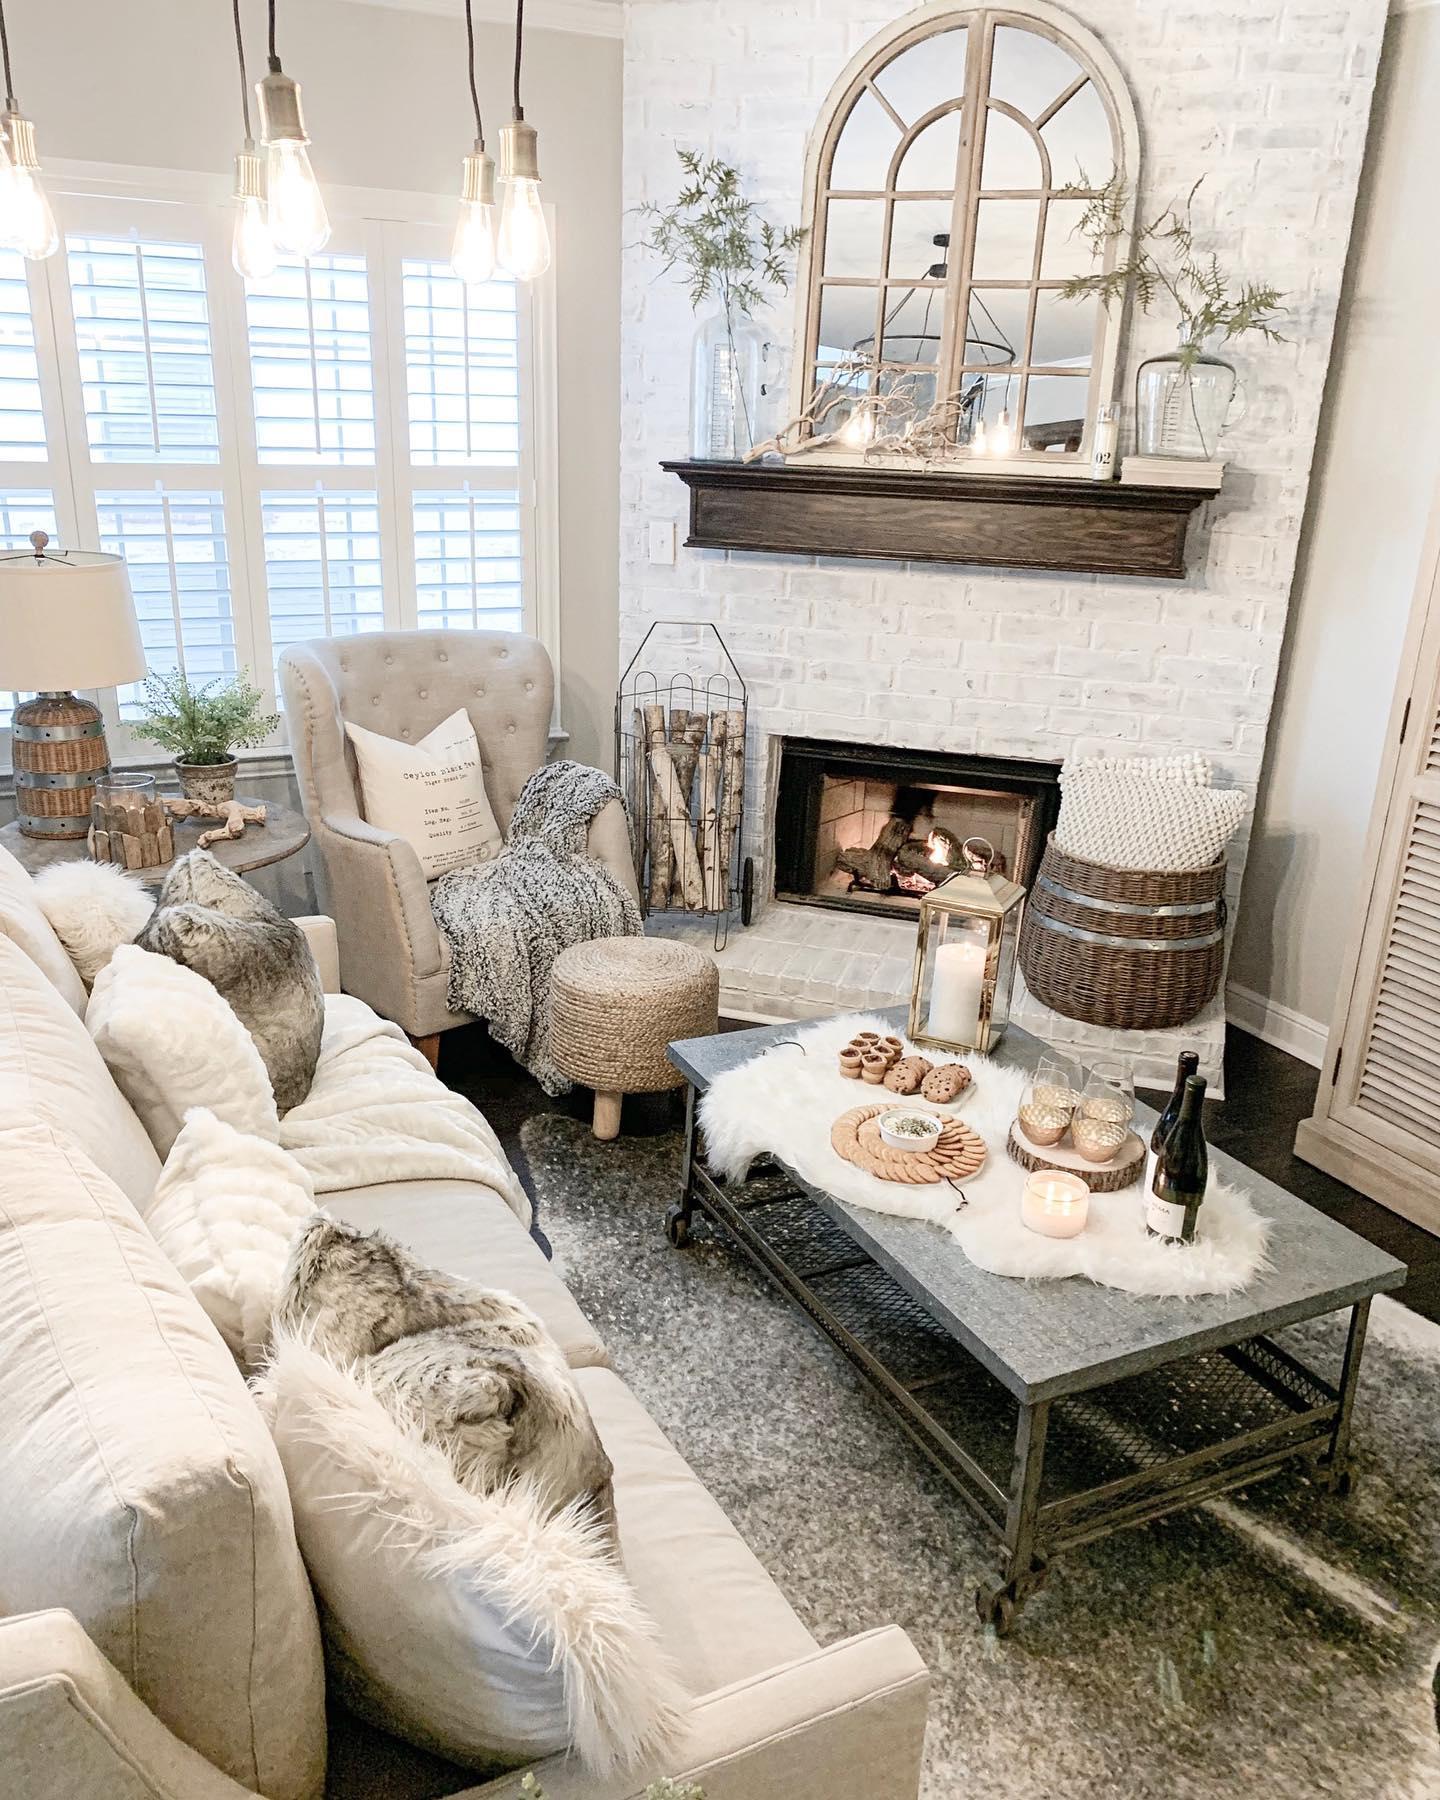 Cozy farmhouse living room Instagram Post